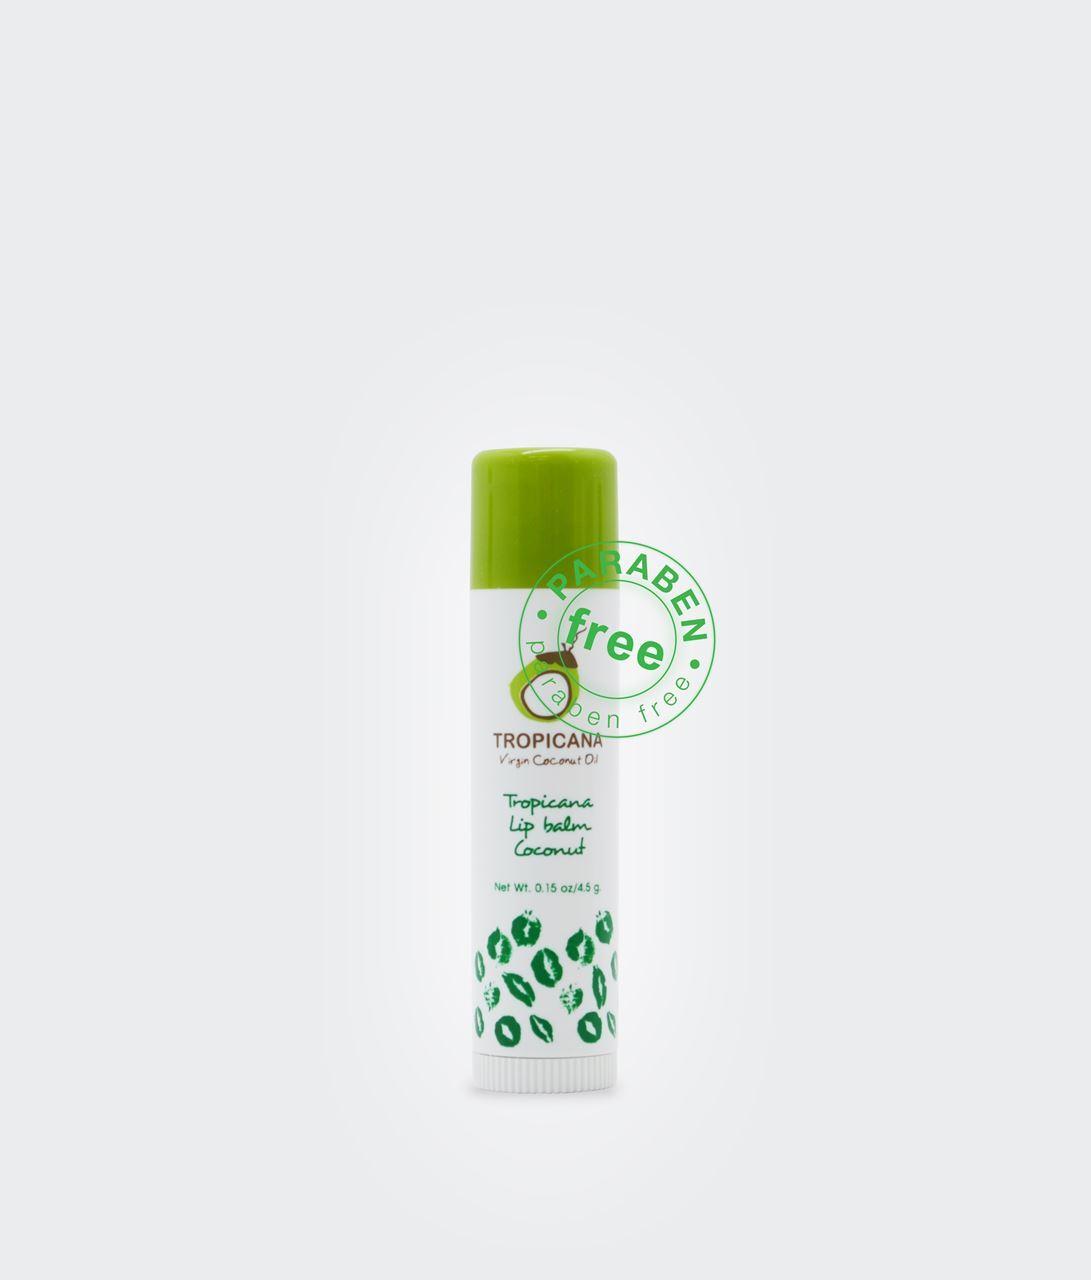 Thai Herbal At Home : Natural Herbal Virgin Coconut Oil Lip Balm Stick